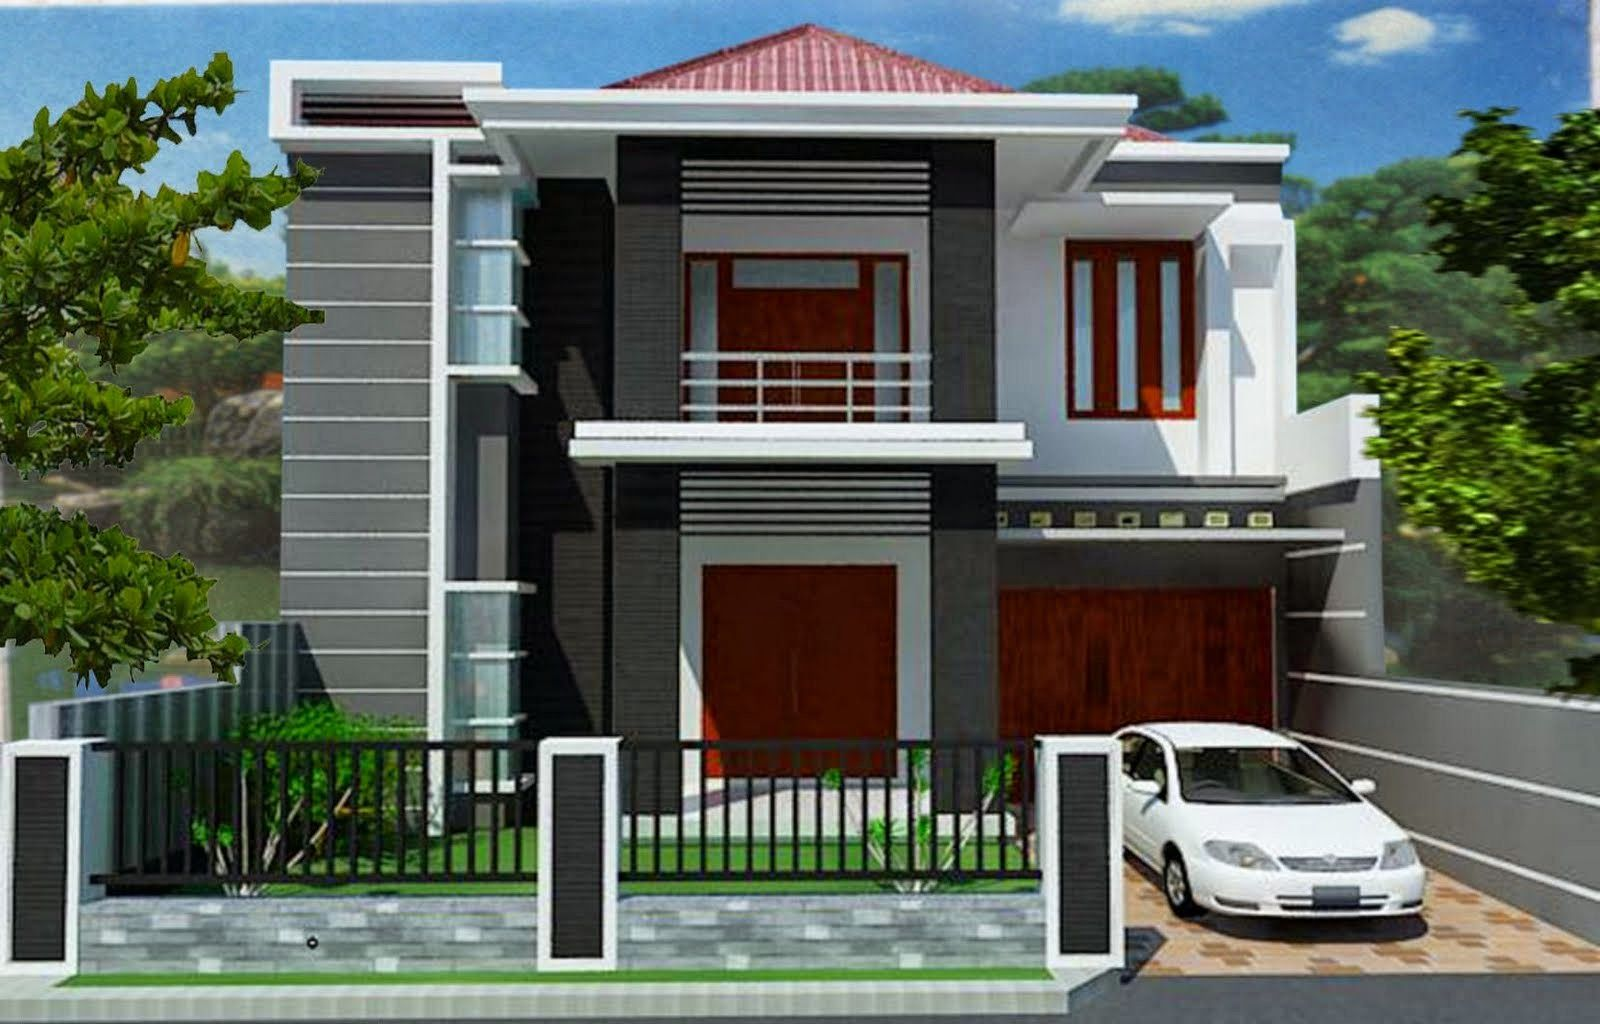 Modern 2 Storey House Designs Desain Balkon Rumah Minimalis Desain Rumah Minimalis